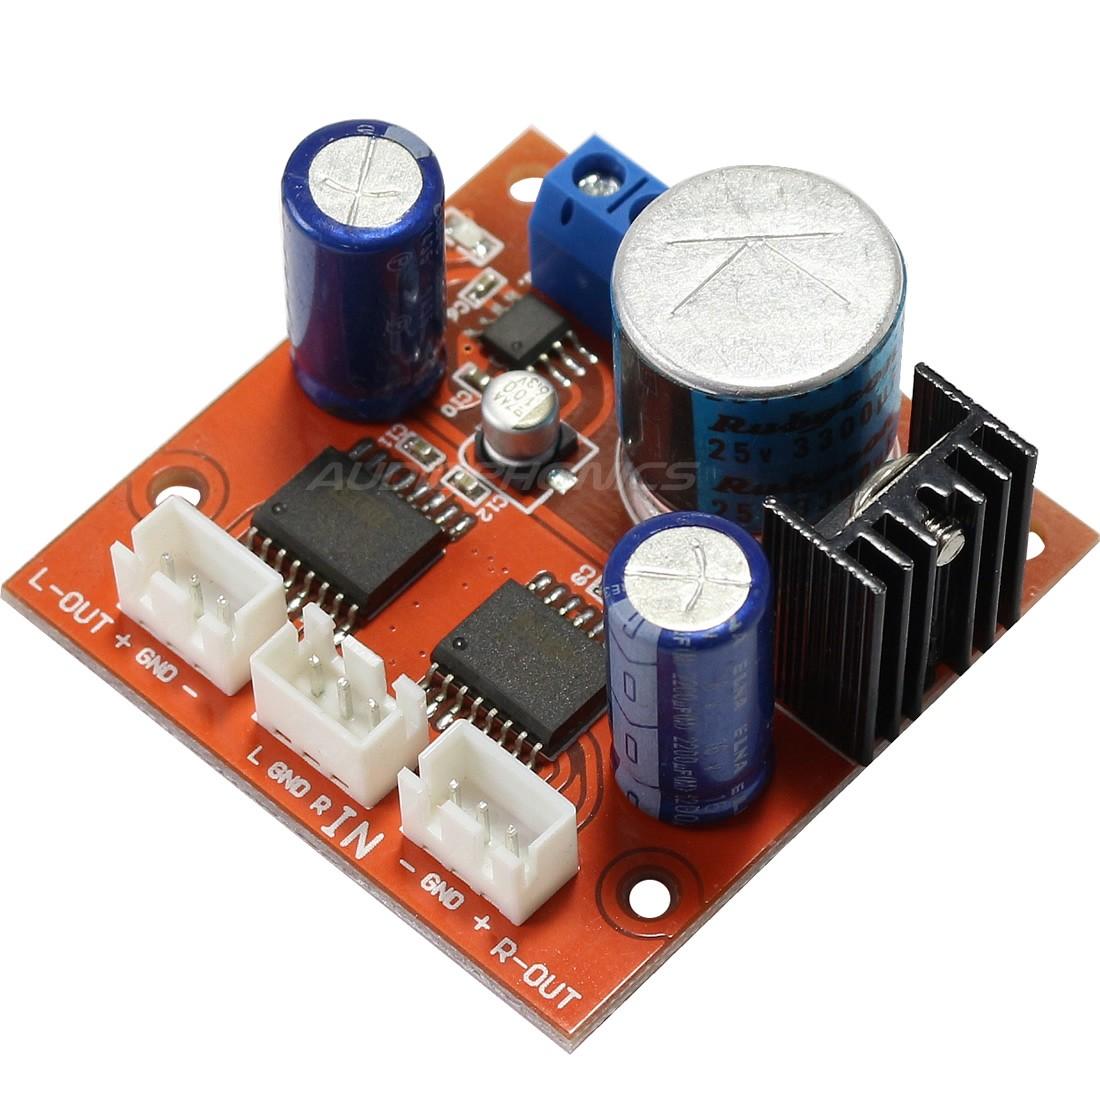 Module Kit unbalanced to balanced symetrizer DRV134 stereo